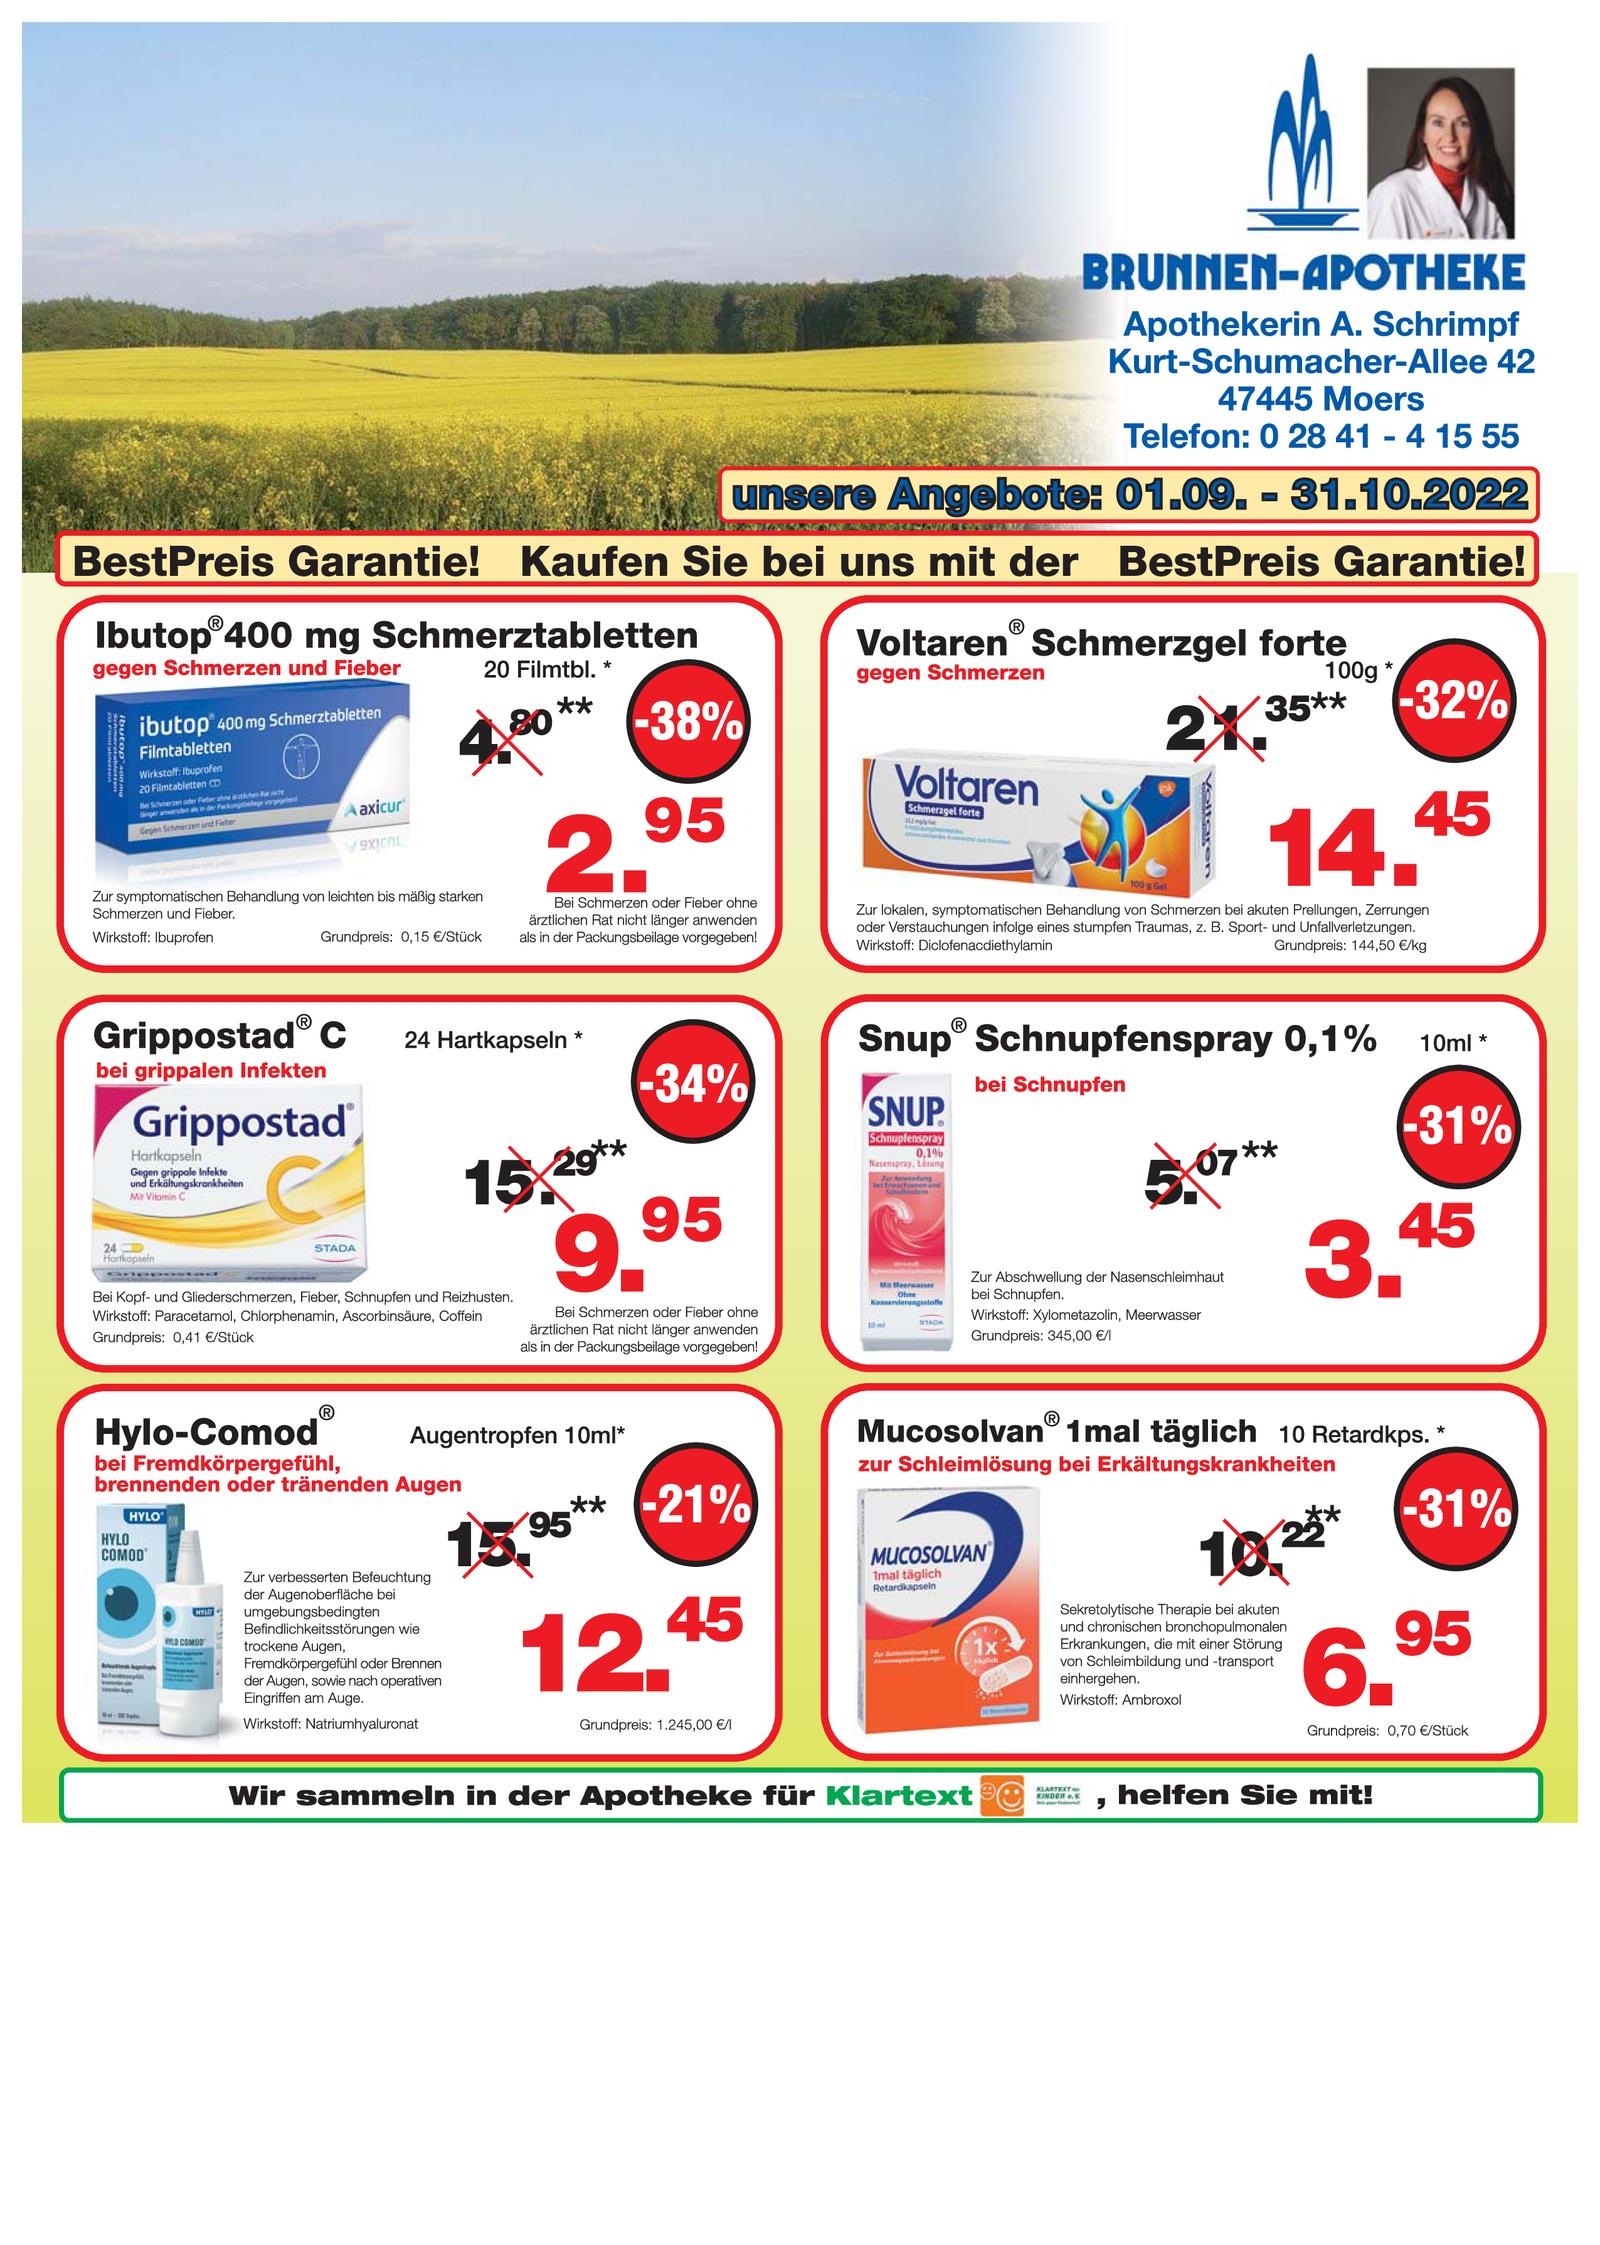 https://mein-uploads.apocdn.net/13790/leaflets/13790_flyer-Seite1.png